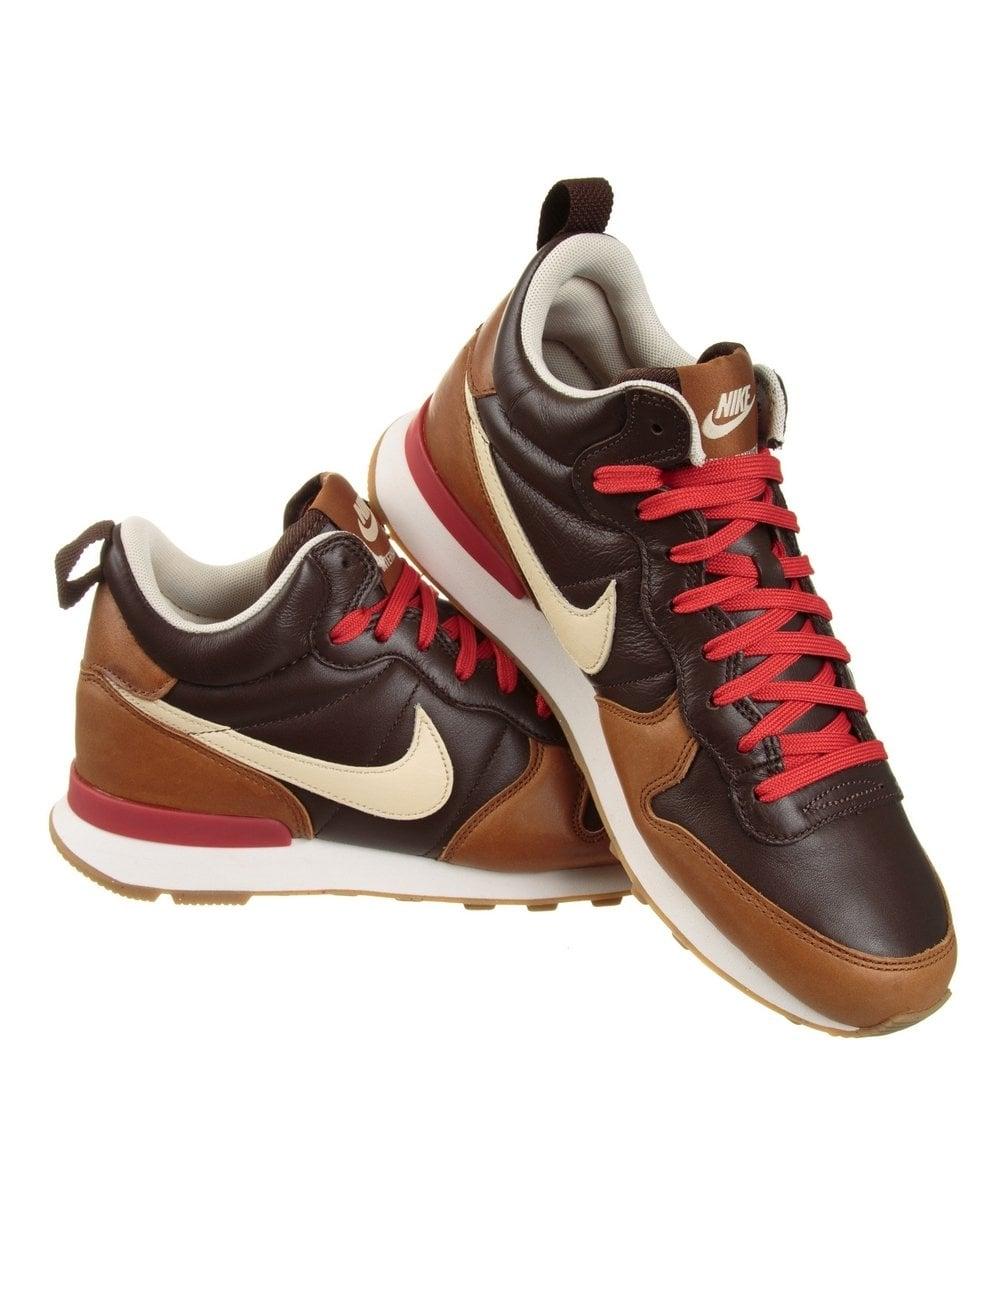 Back Vapor Greylilacorange Nike 9 Women's 5 Shoe Zoom 23 Is Tour 1cTlFKu3J5